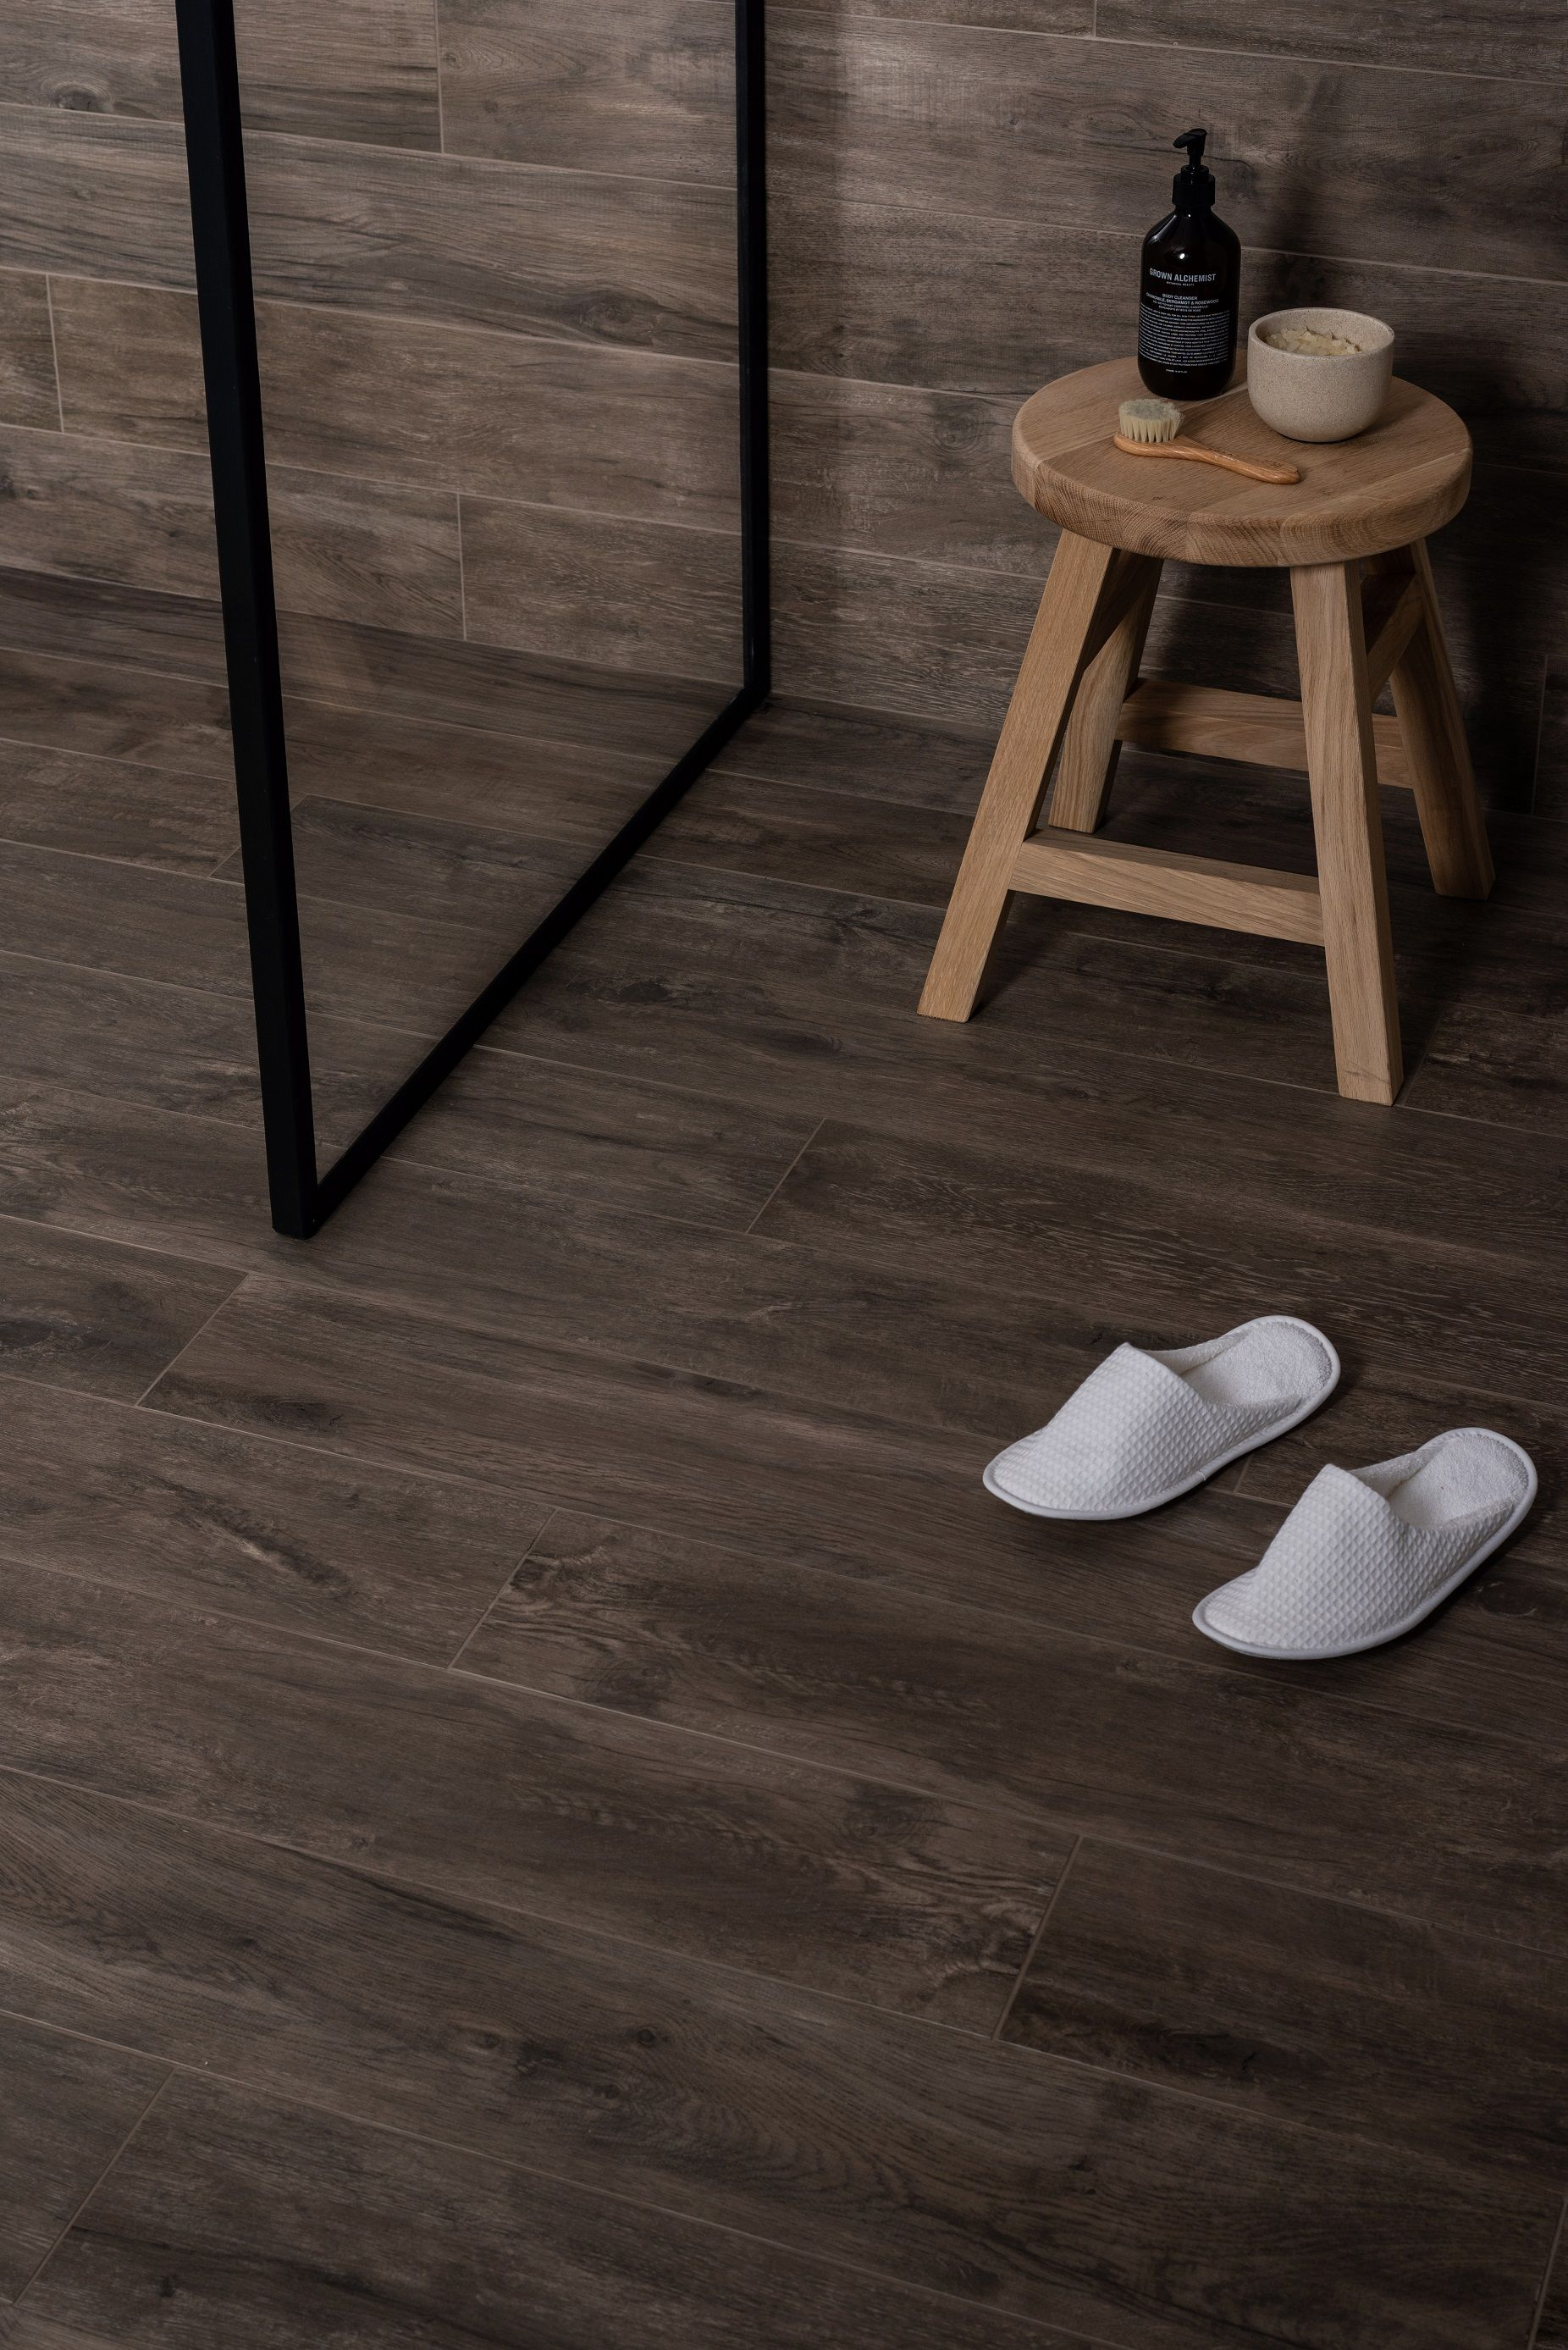 Wood Effect Tiles Wood Effect Tiles Tile Trends Tiles